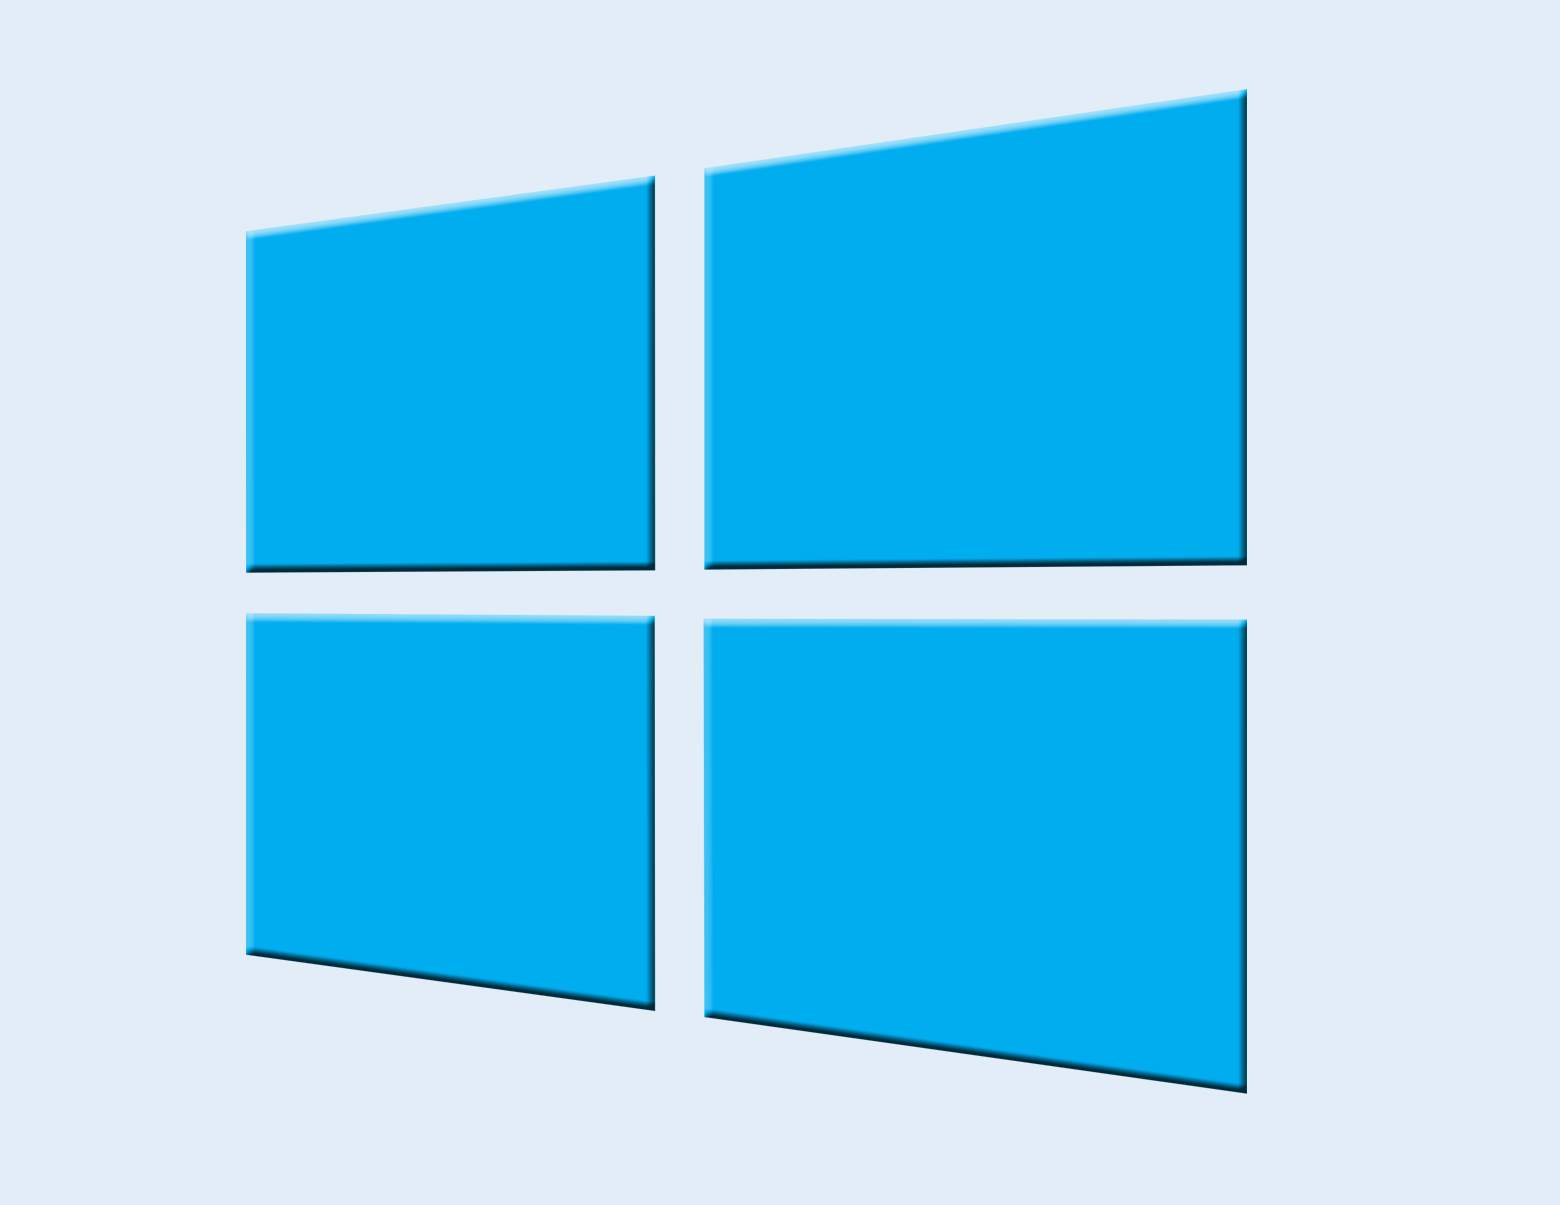 pause windows 10 update